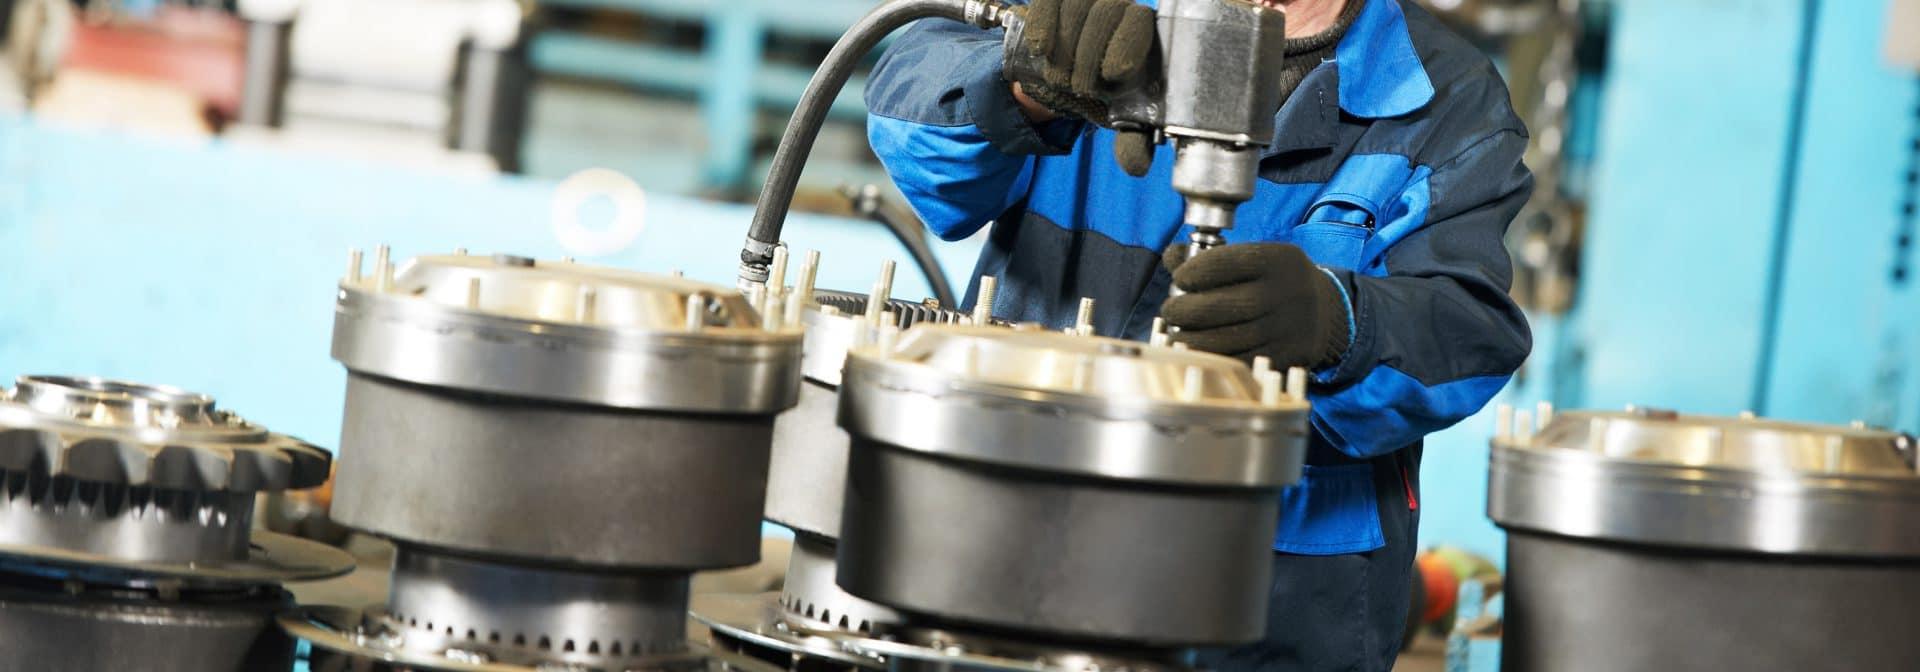 Assembling casting, forgings and bearings